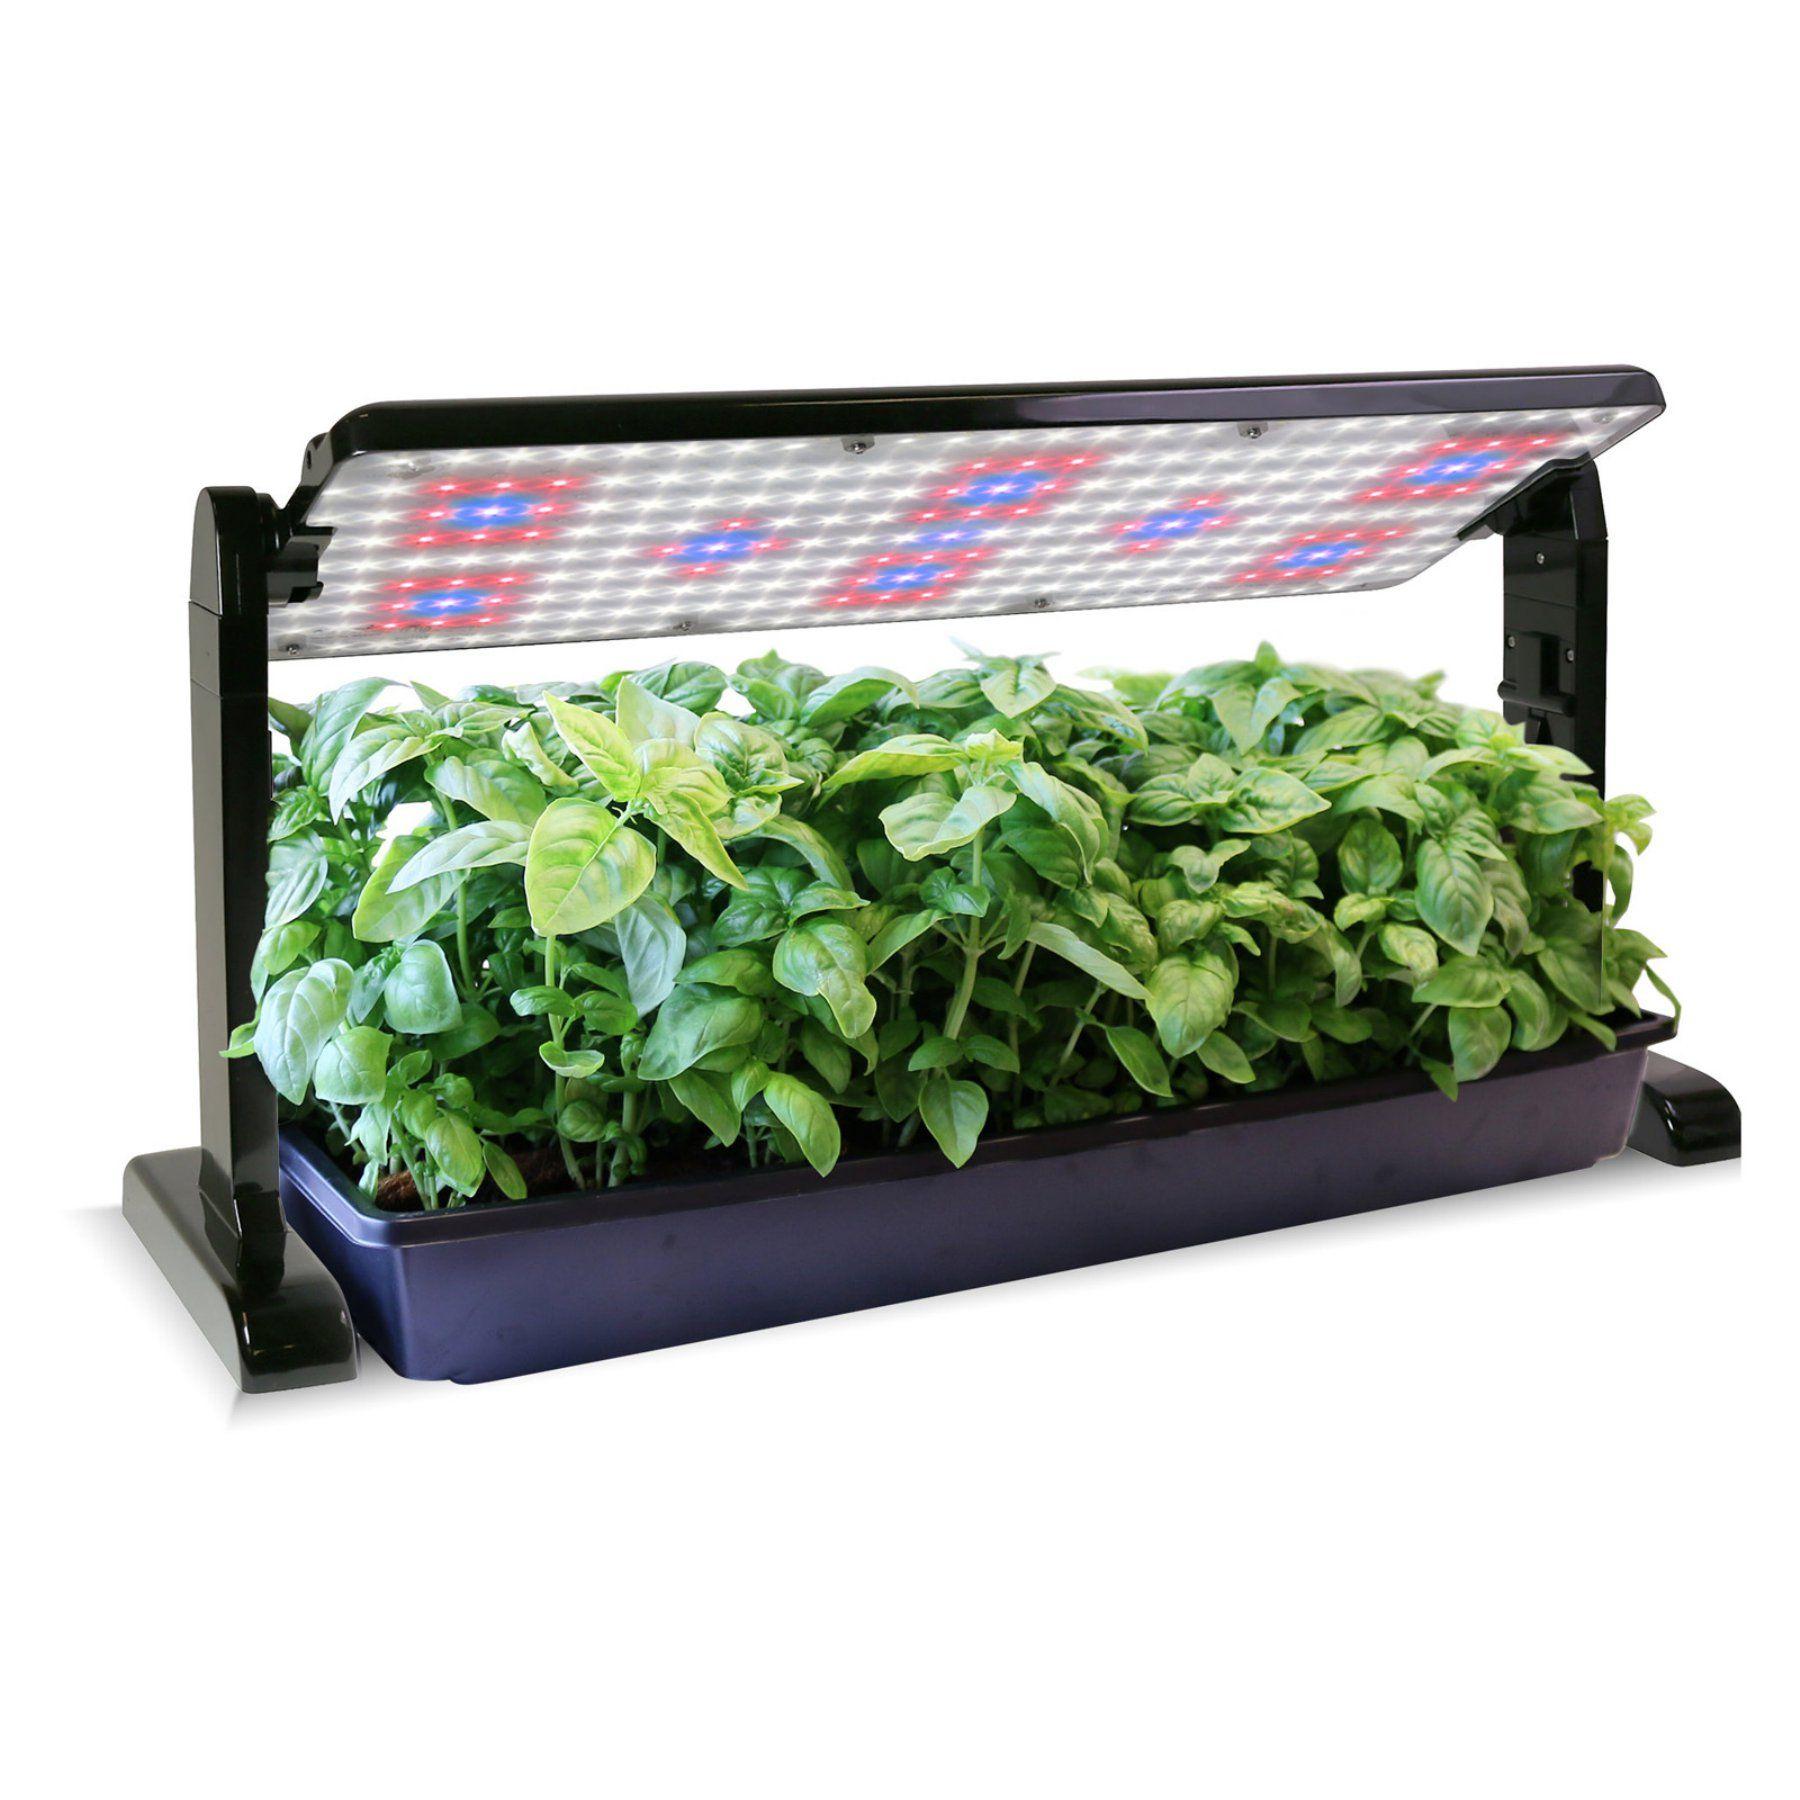 Aerogarden 45 Watt Grow Light Panel For Hydroponic Garden 400 x 300